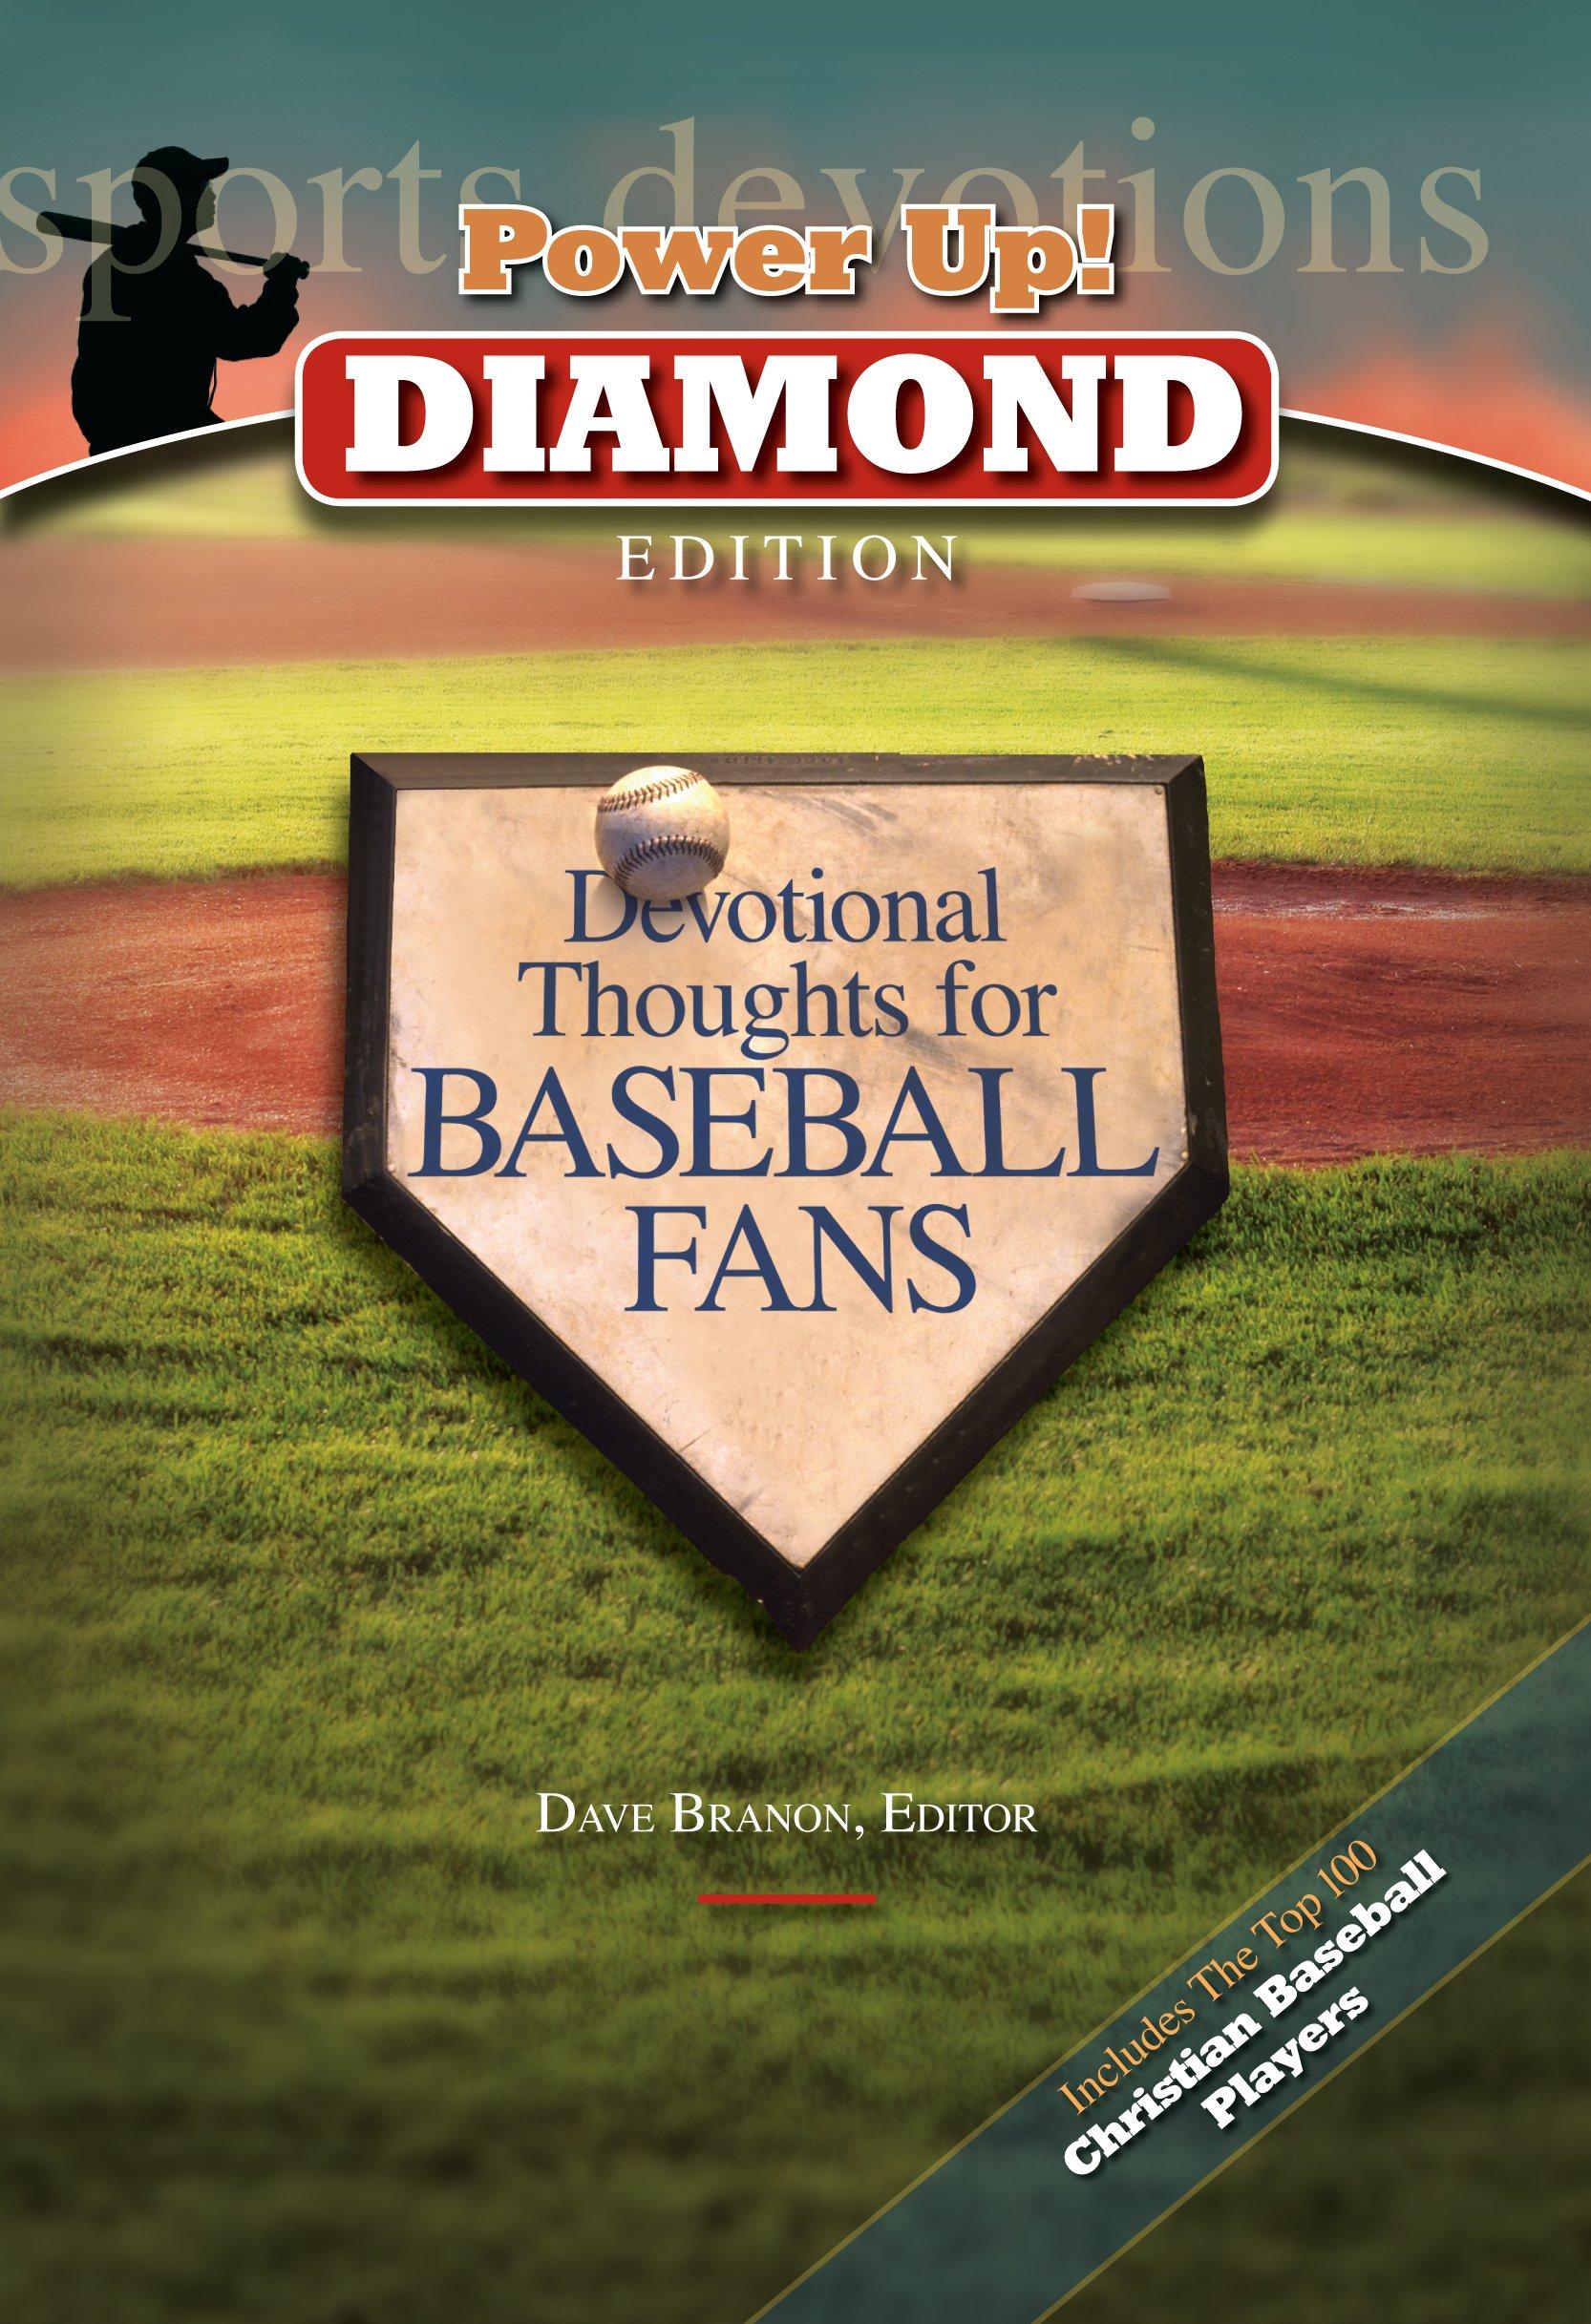 Power Up! Diamond: Devotional Thoughts for Baseball Fans: Dave Branon,  David Branon: 9781572933187: Books - Amazon.ca